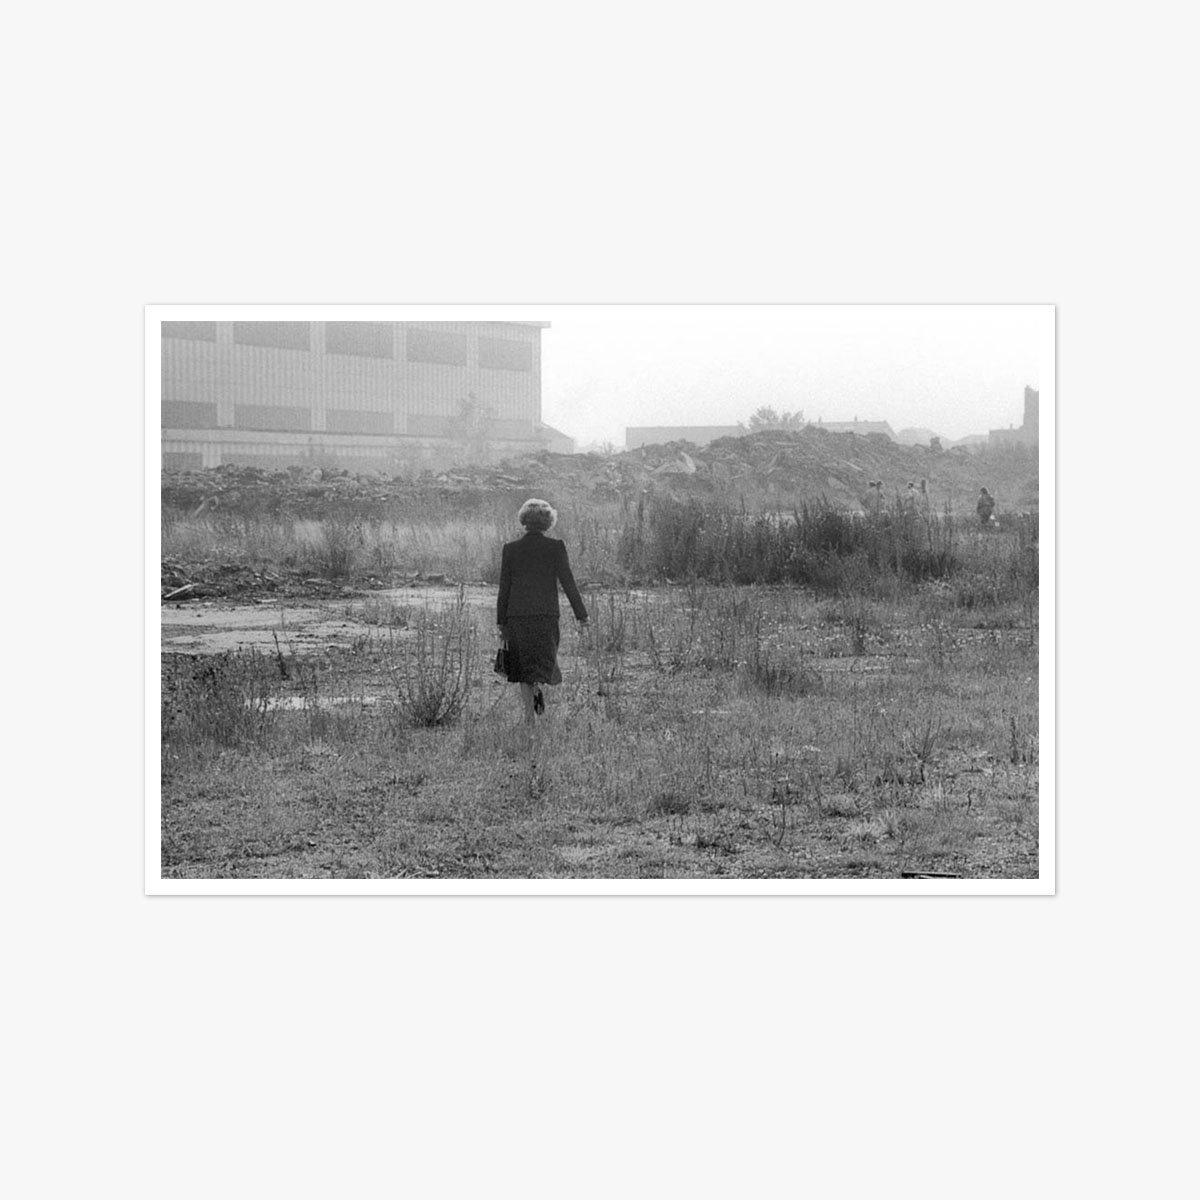 Thatcher on Teeside by John Voos